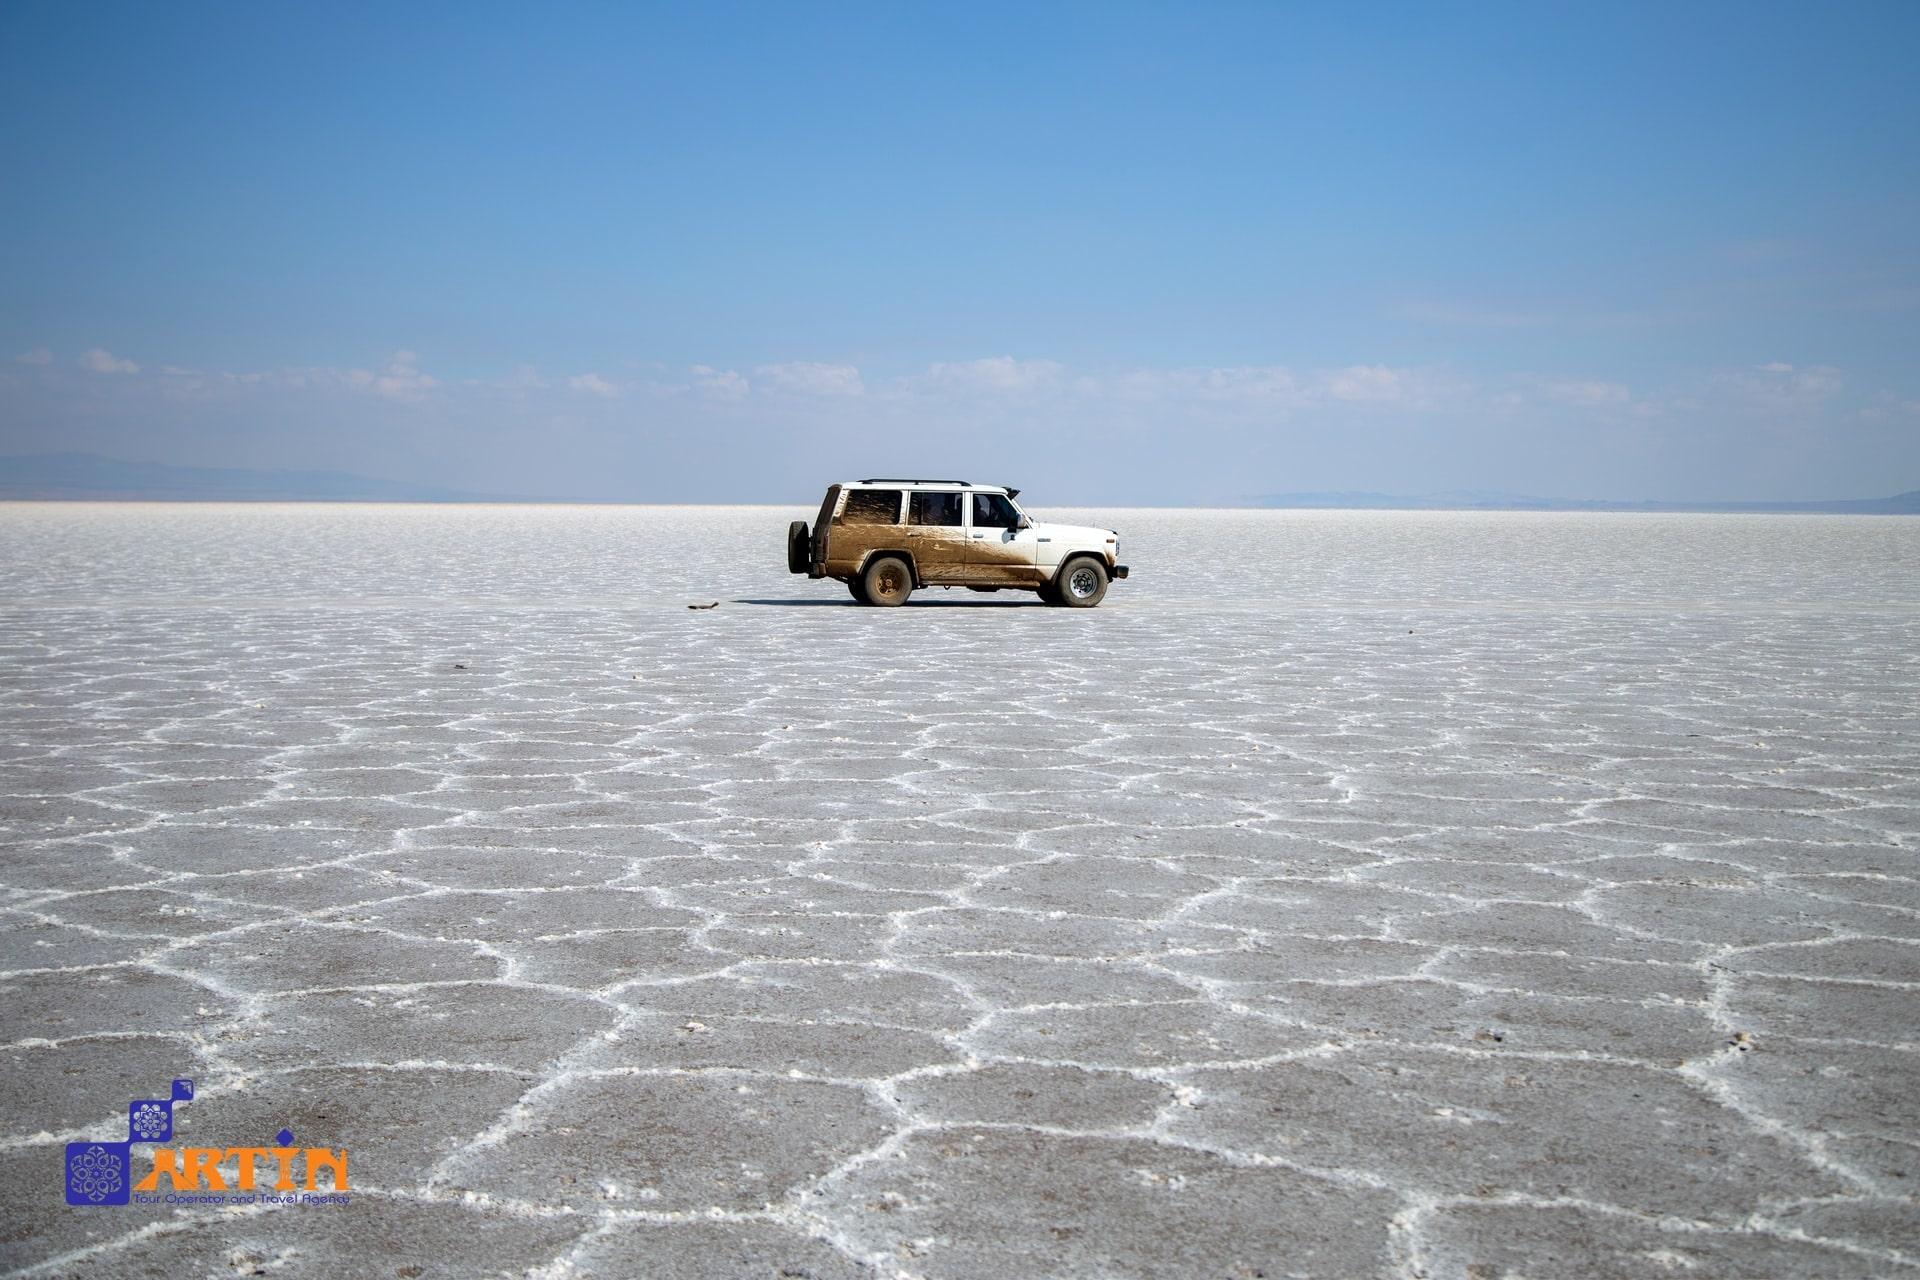 The wandering island in Maranjab desert